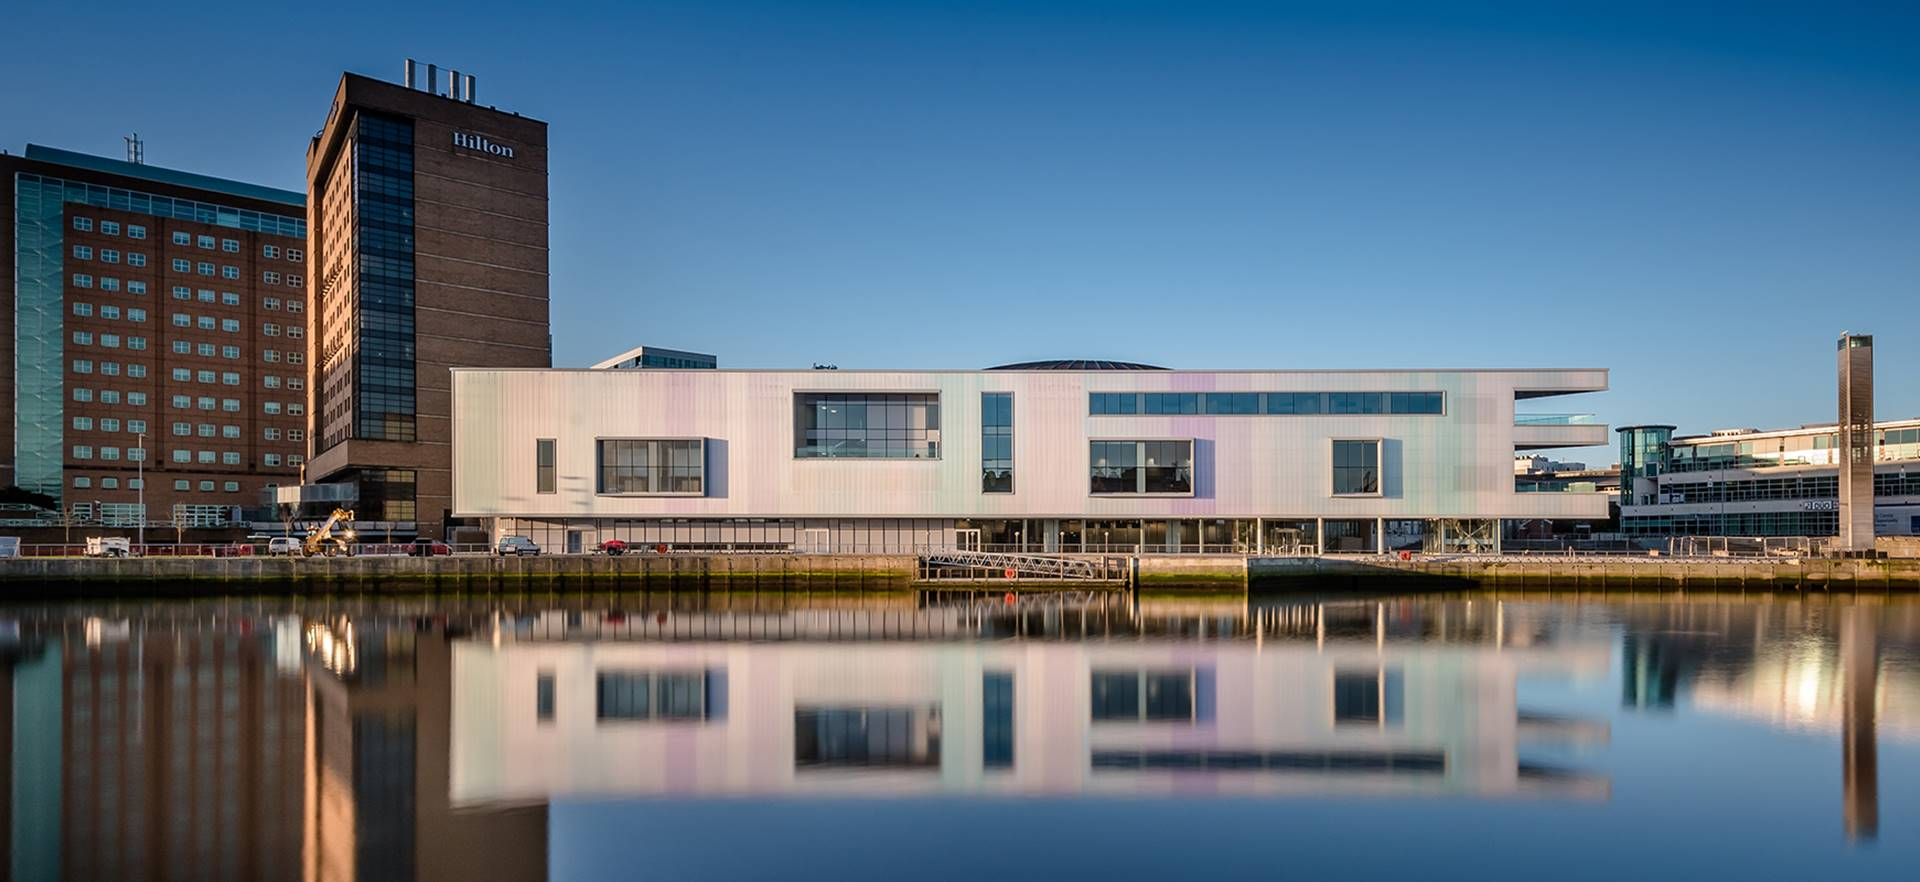 <h6>GB - Belfast - Waterfront Hall